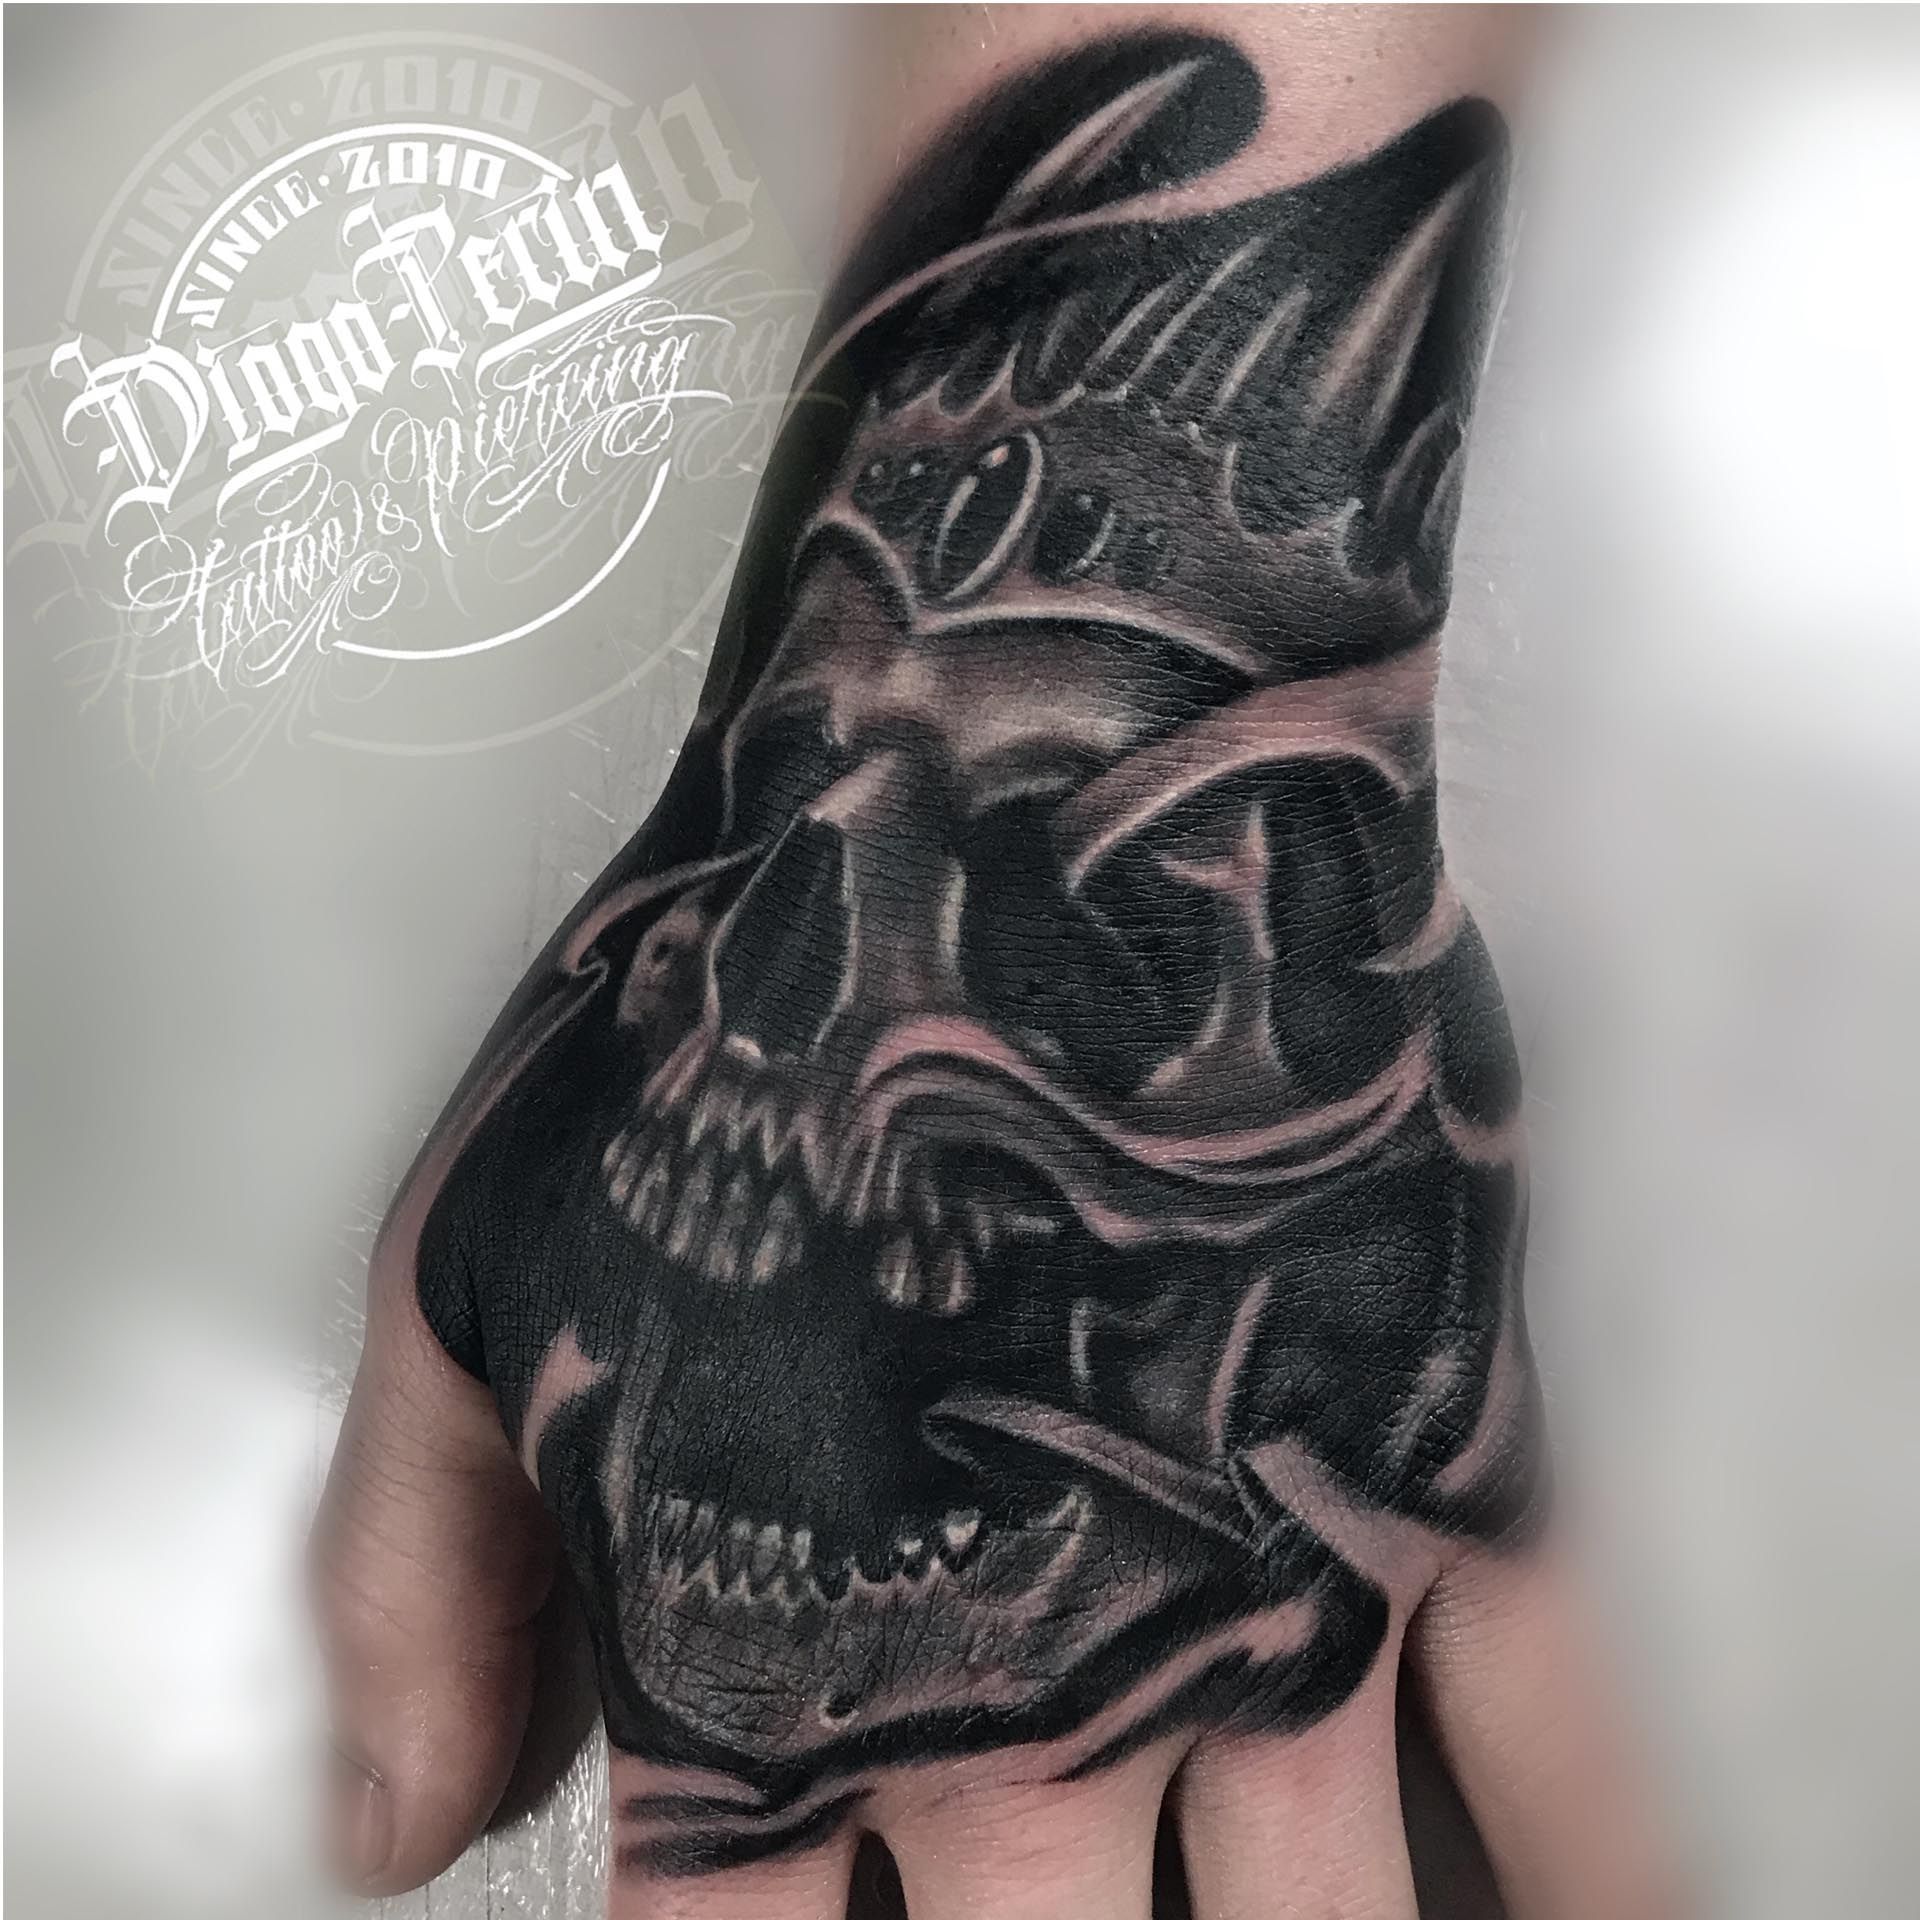 tatuaje calavera Alicante Tatuaje mano tatuaje realista tatuaje byn realistic tattoo